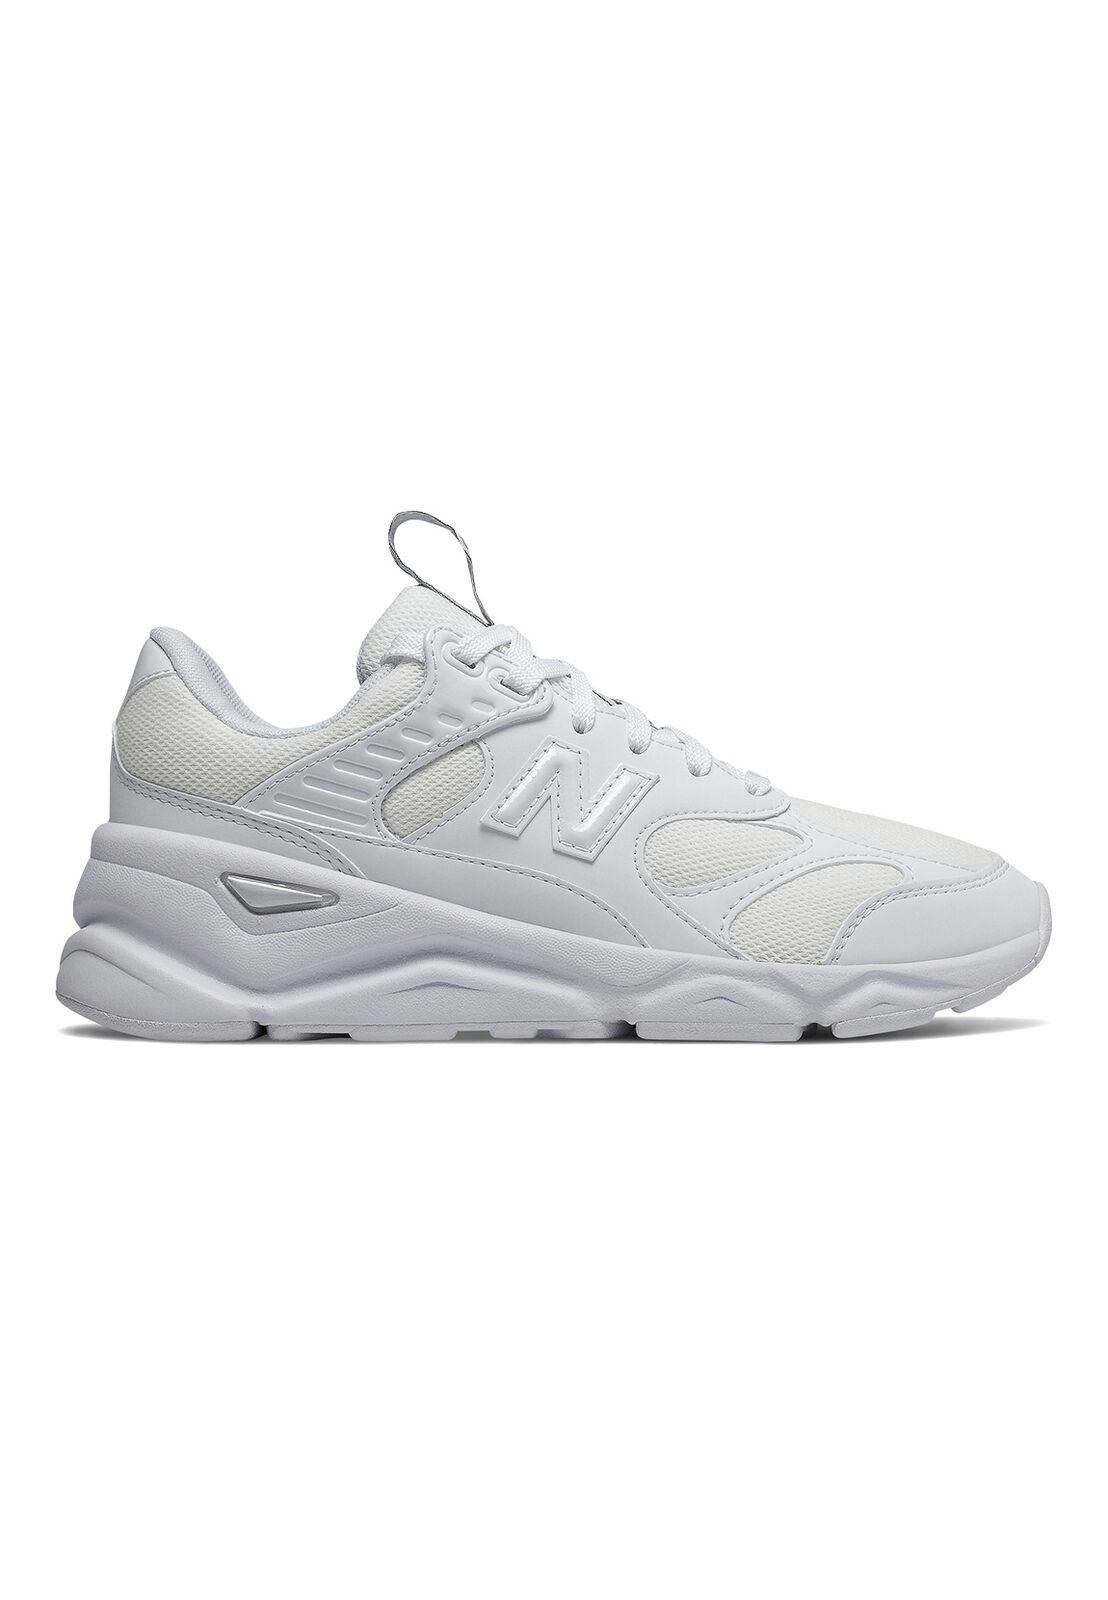 New Balance Sneaker Women's Wxs90tma White